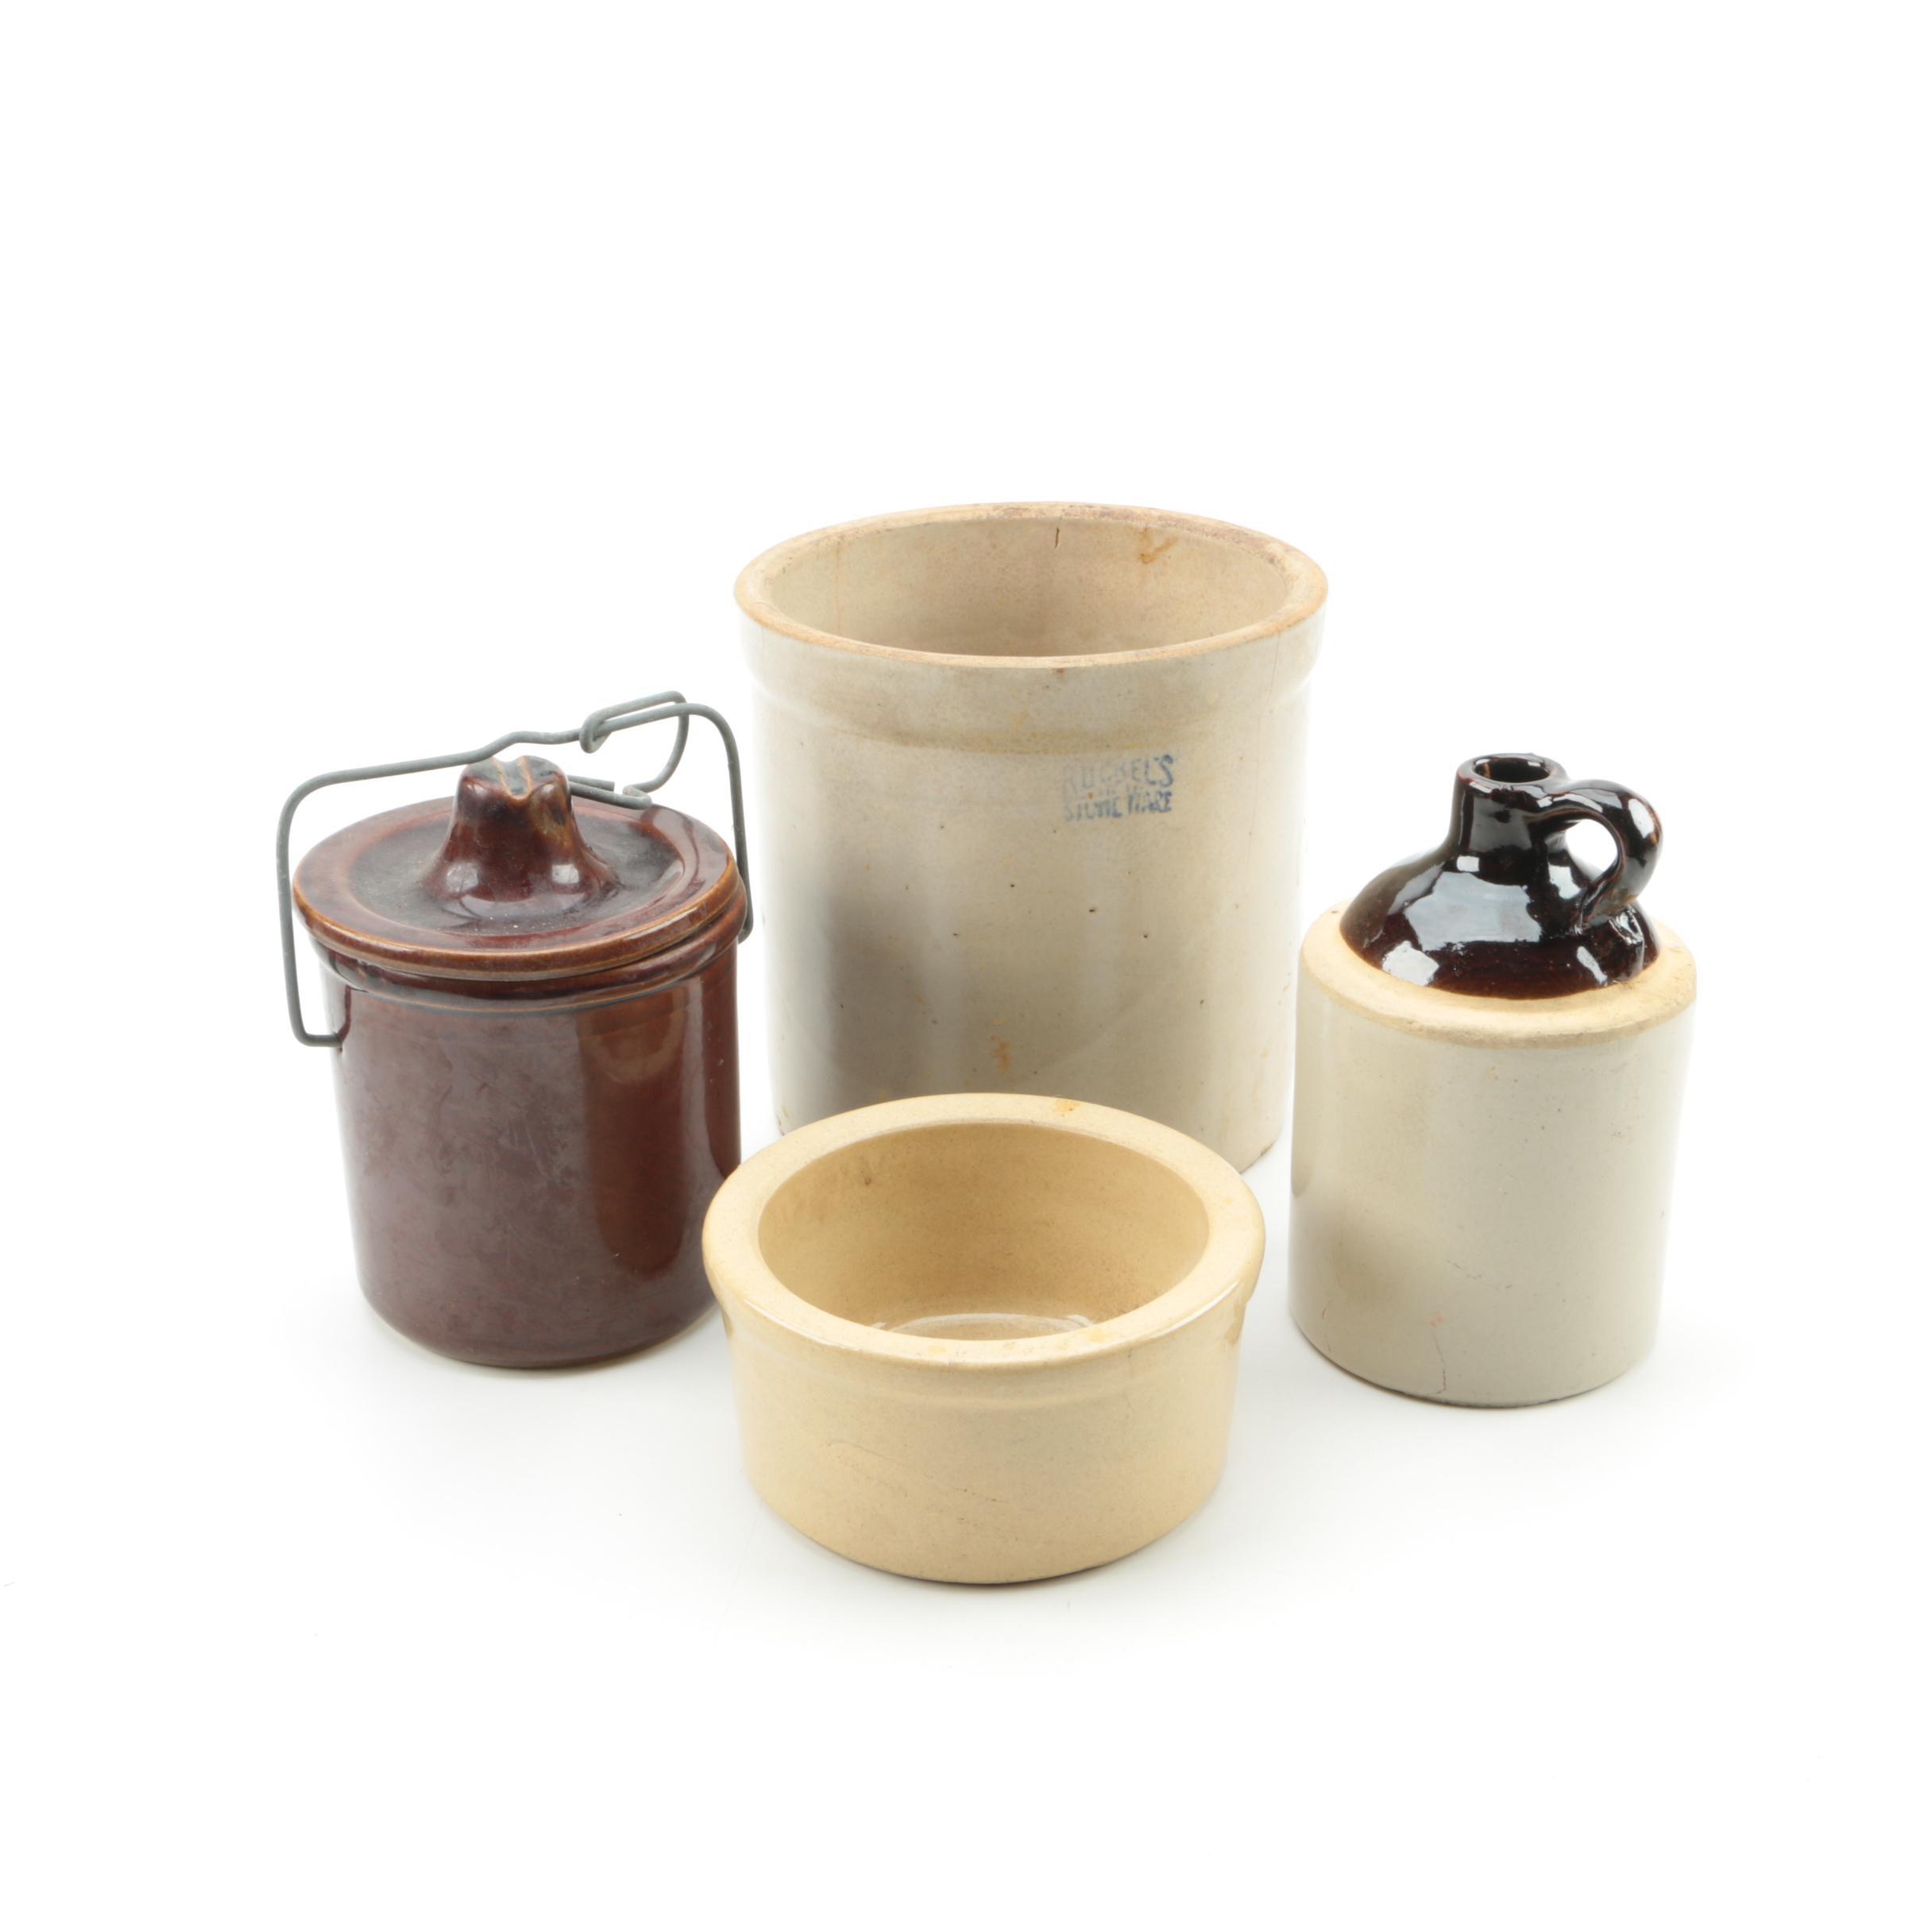 Vintage Salt Glazed Stoneware Crocks and a Jug